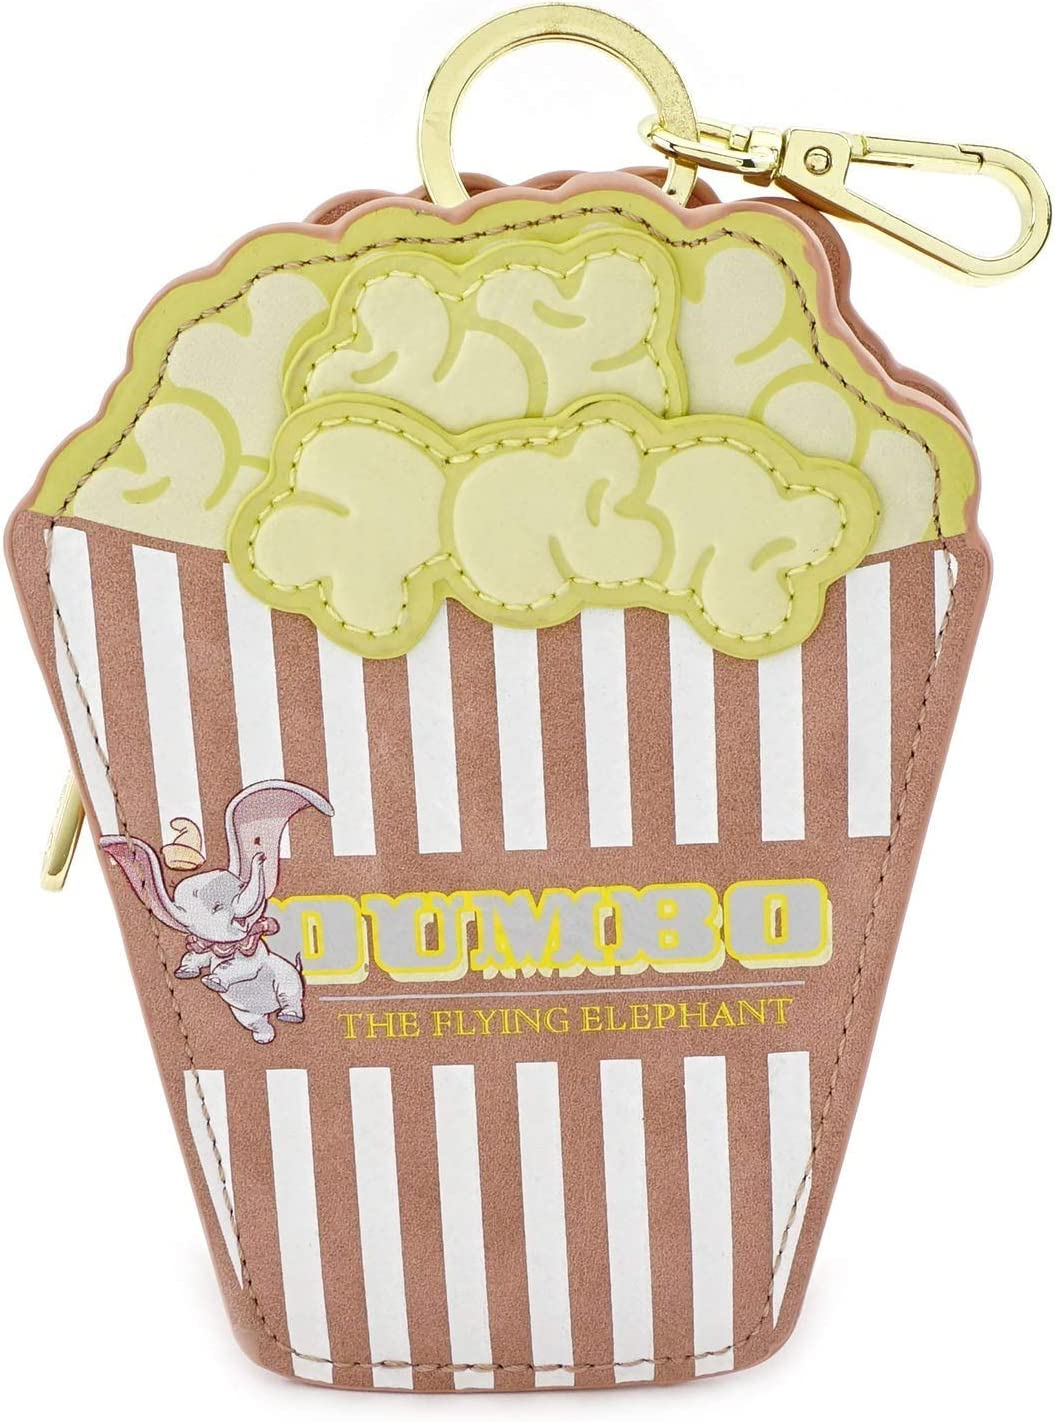 Einheitsgr/ö/ße Disney Dumbo Popcorn Tasche multi Loungefly Kunstleder Rei/ßverschluss Clip M/ünzgeldb/örse,